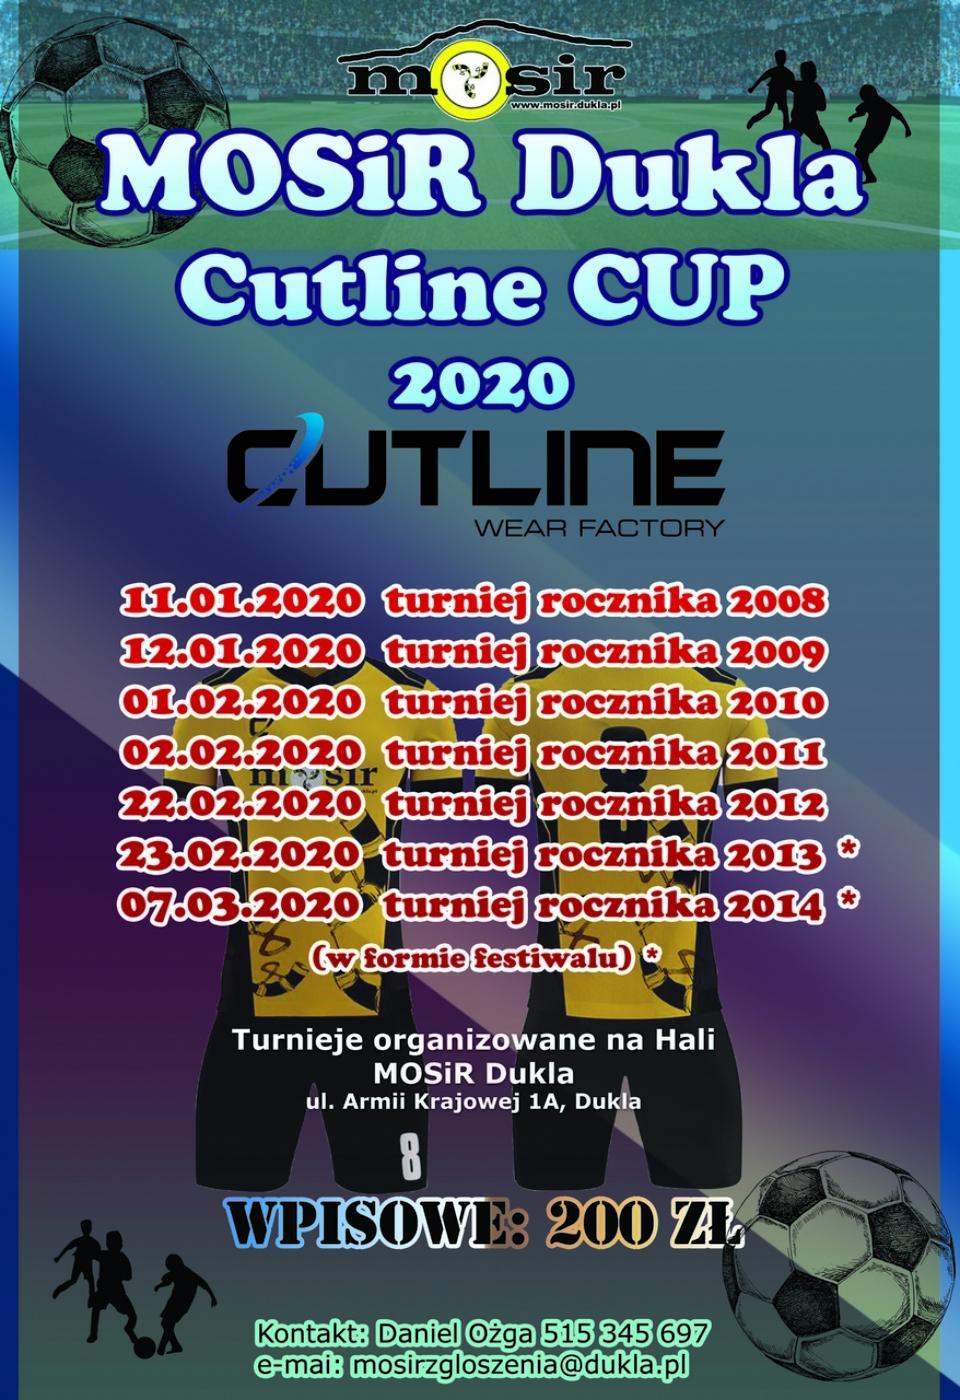 Plakat mosir dukla cup 2020m